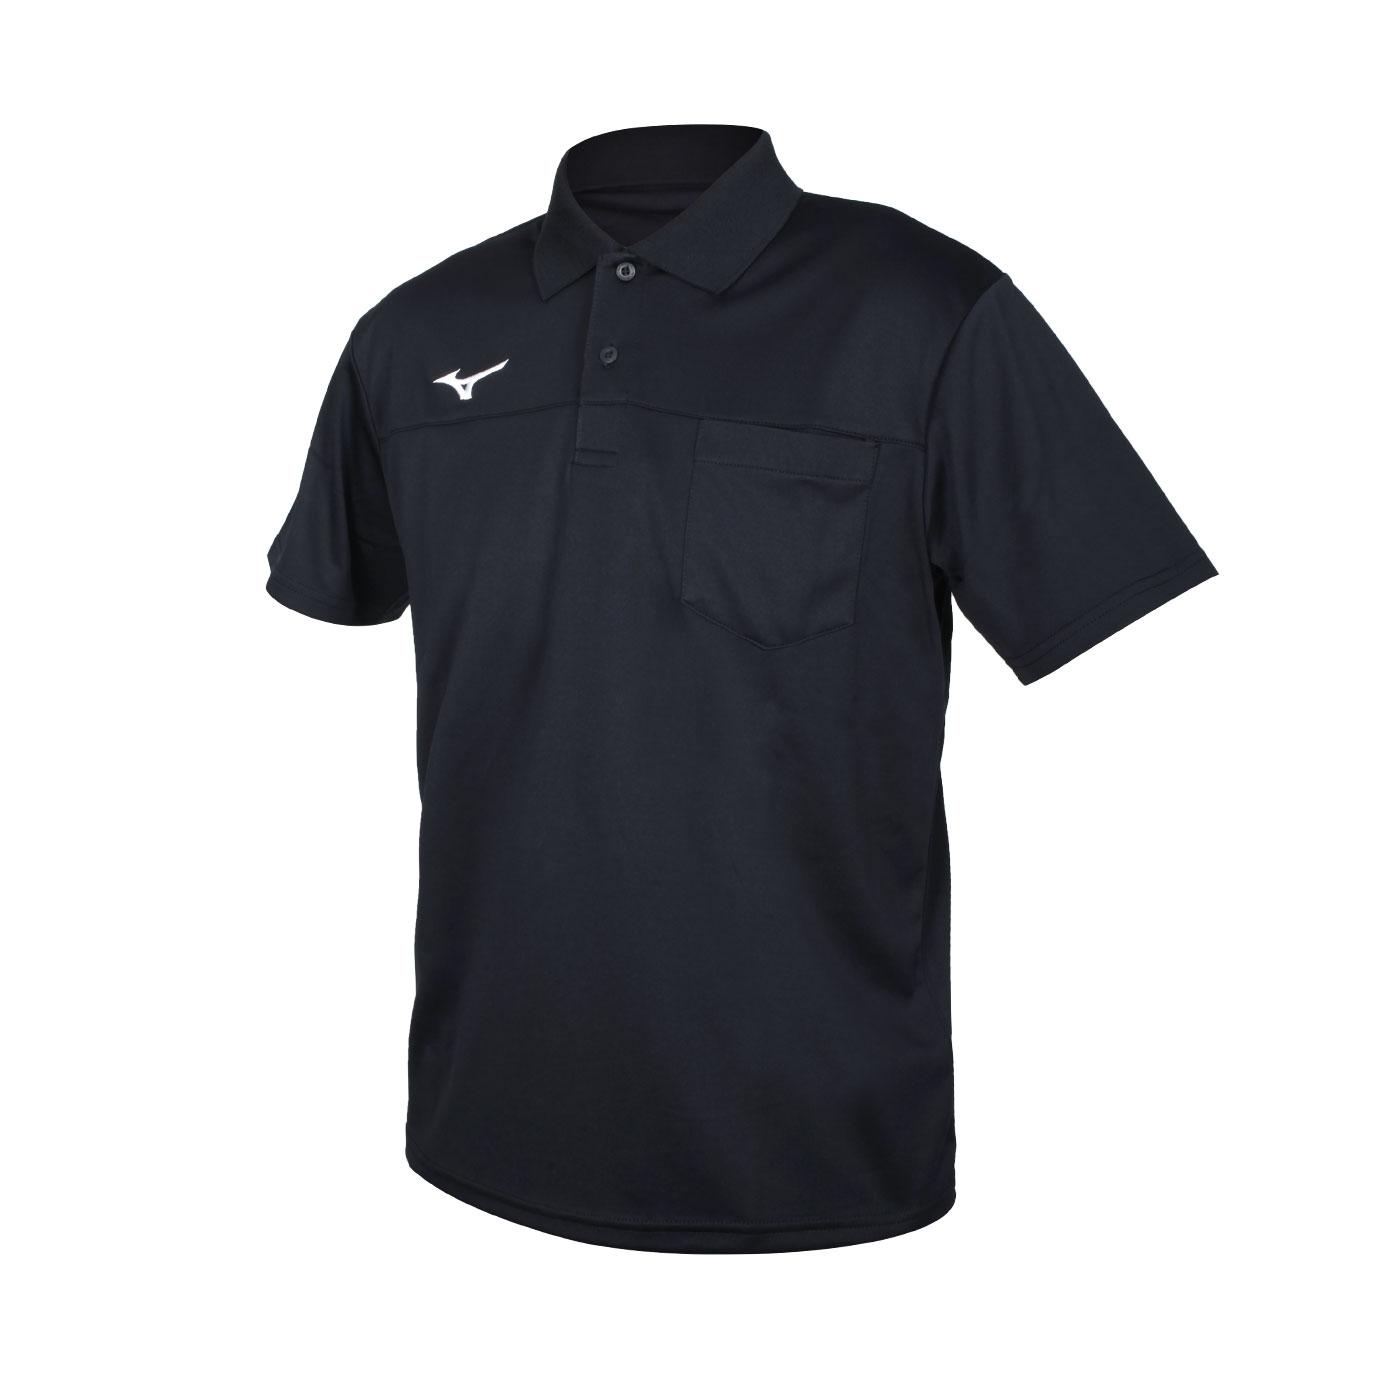 MIZUNO 男款短袖POLO衫 32TA151709 - 黑白